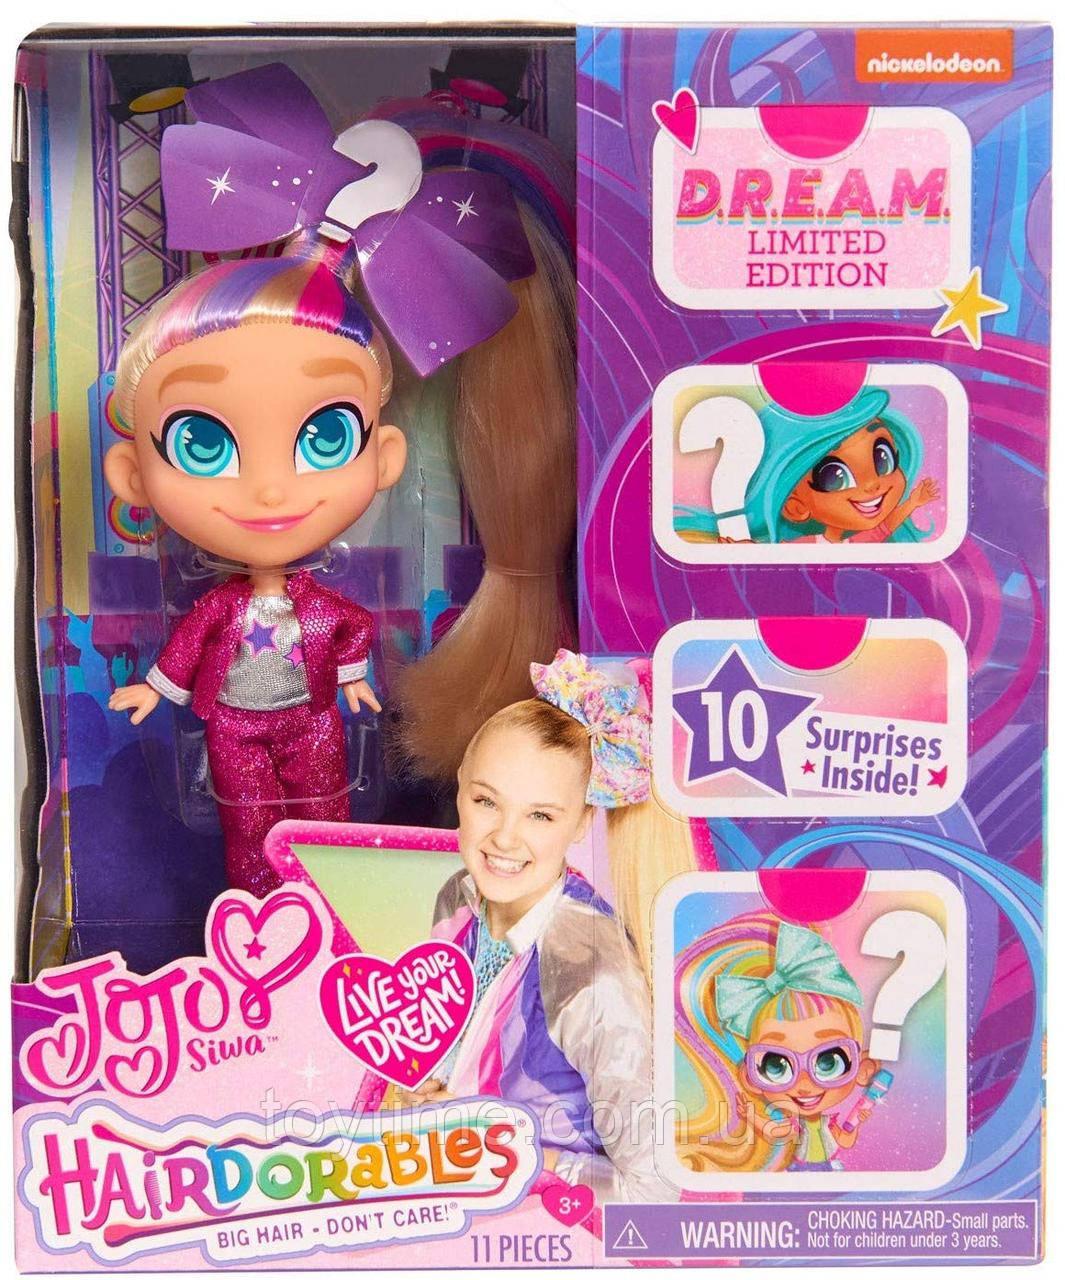 Хейрдораблес ДжоДжо Сива ограниченная серия / Hairdorables JoJo Siwa Limited Edition D.R.E.A.M. Doll Style A